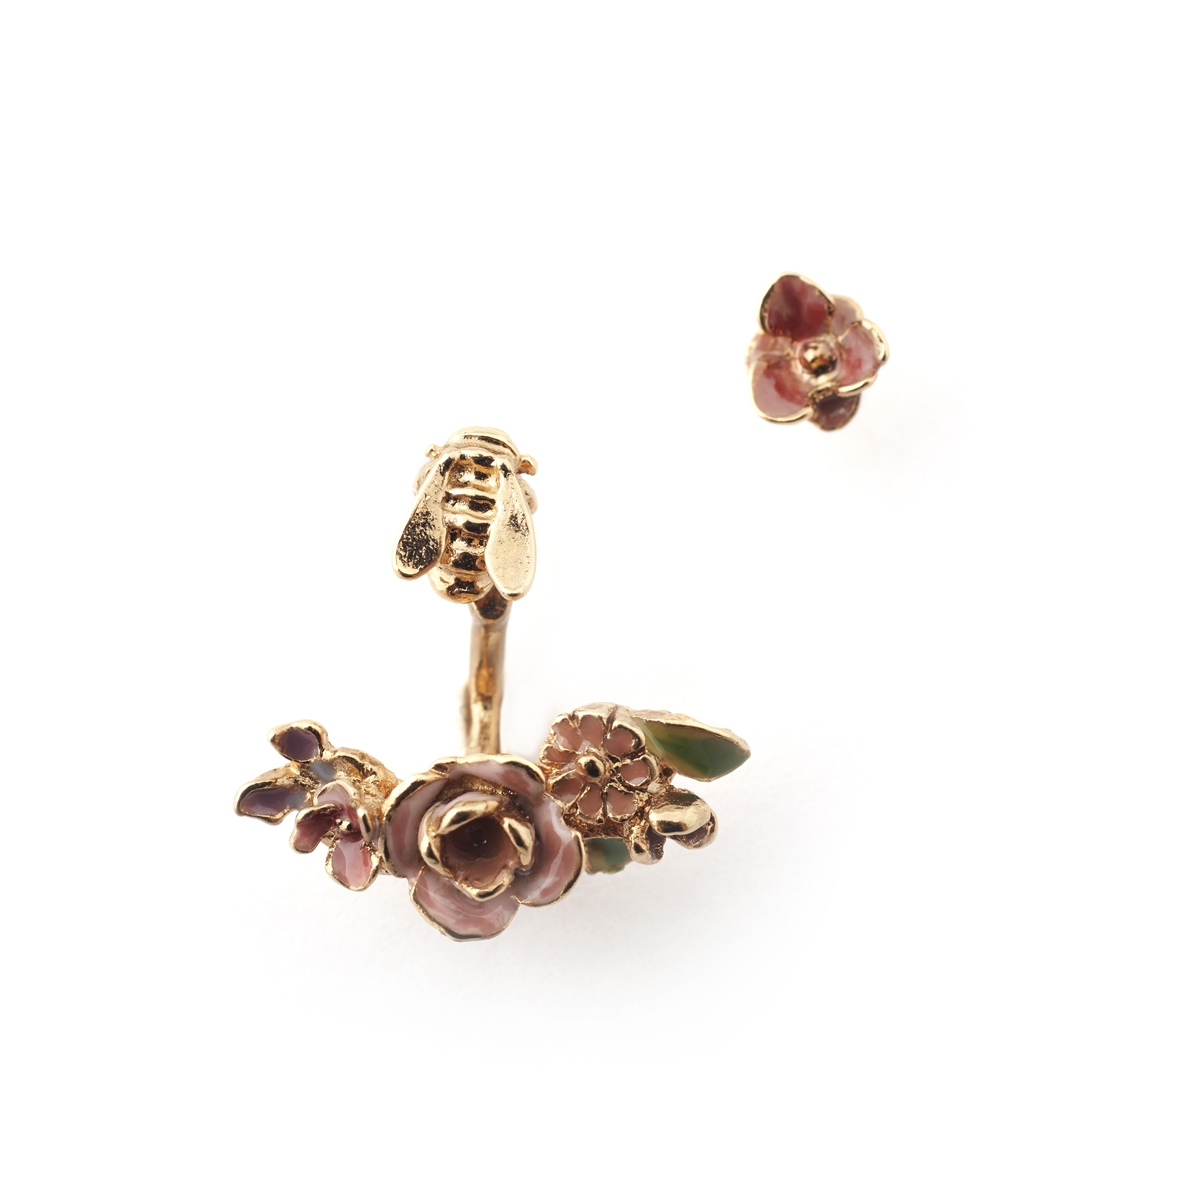 Mini Vintage Rose Through Earring Amp Stud Fashion Jewellery